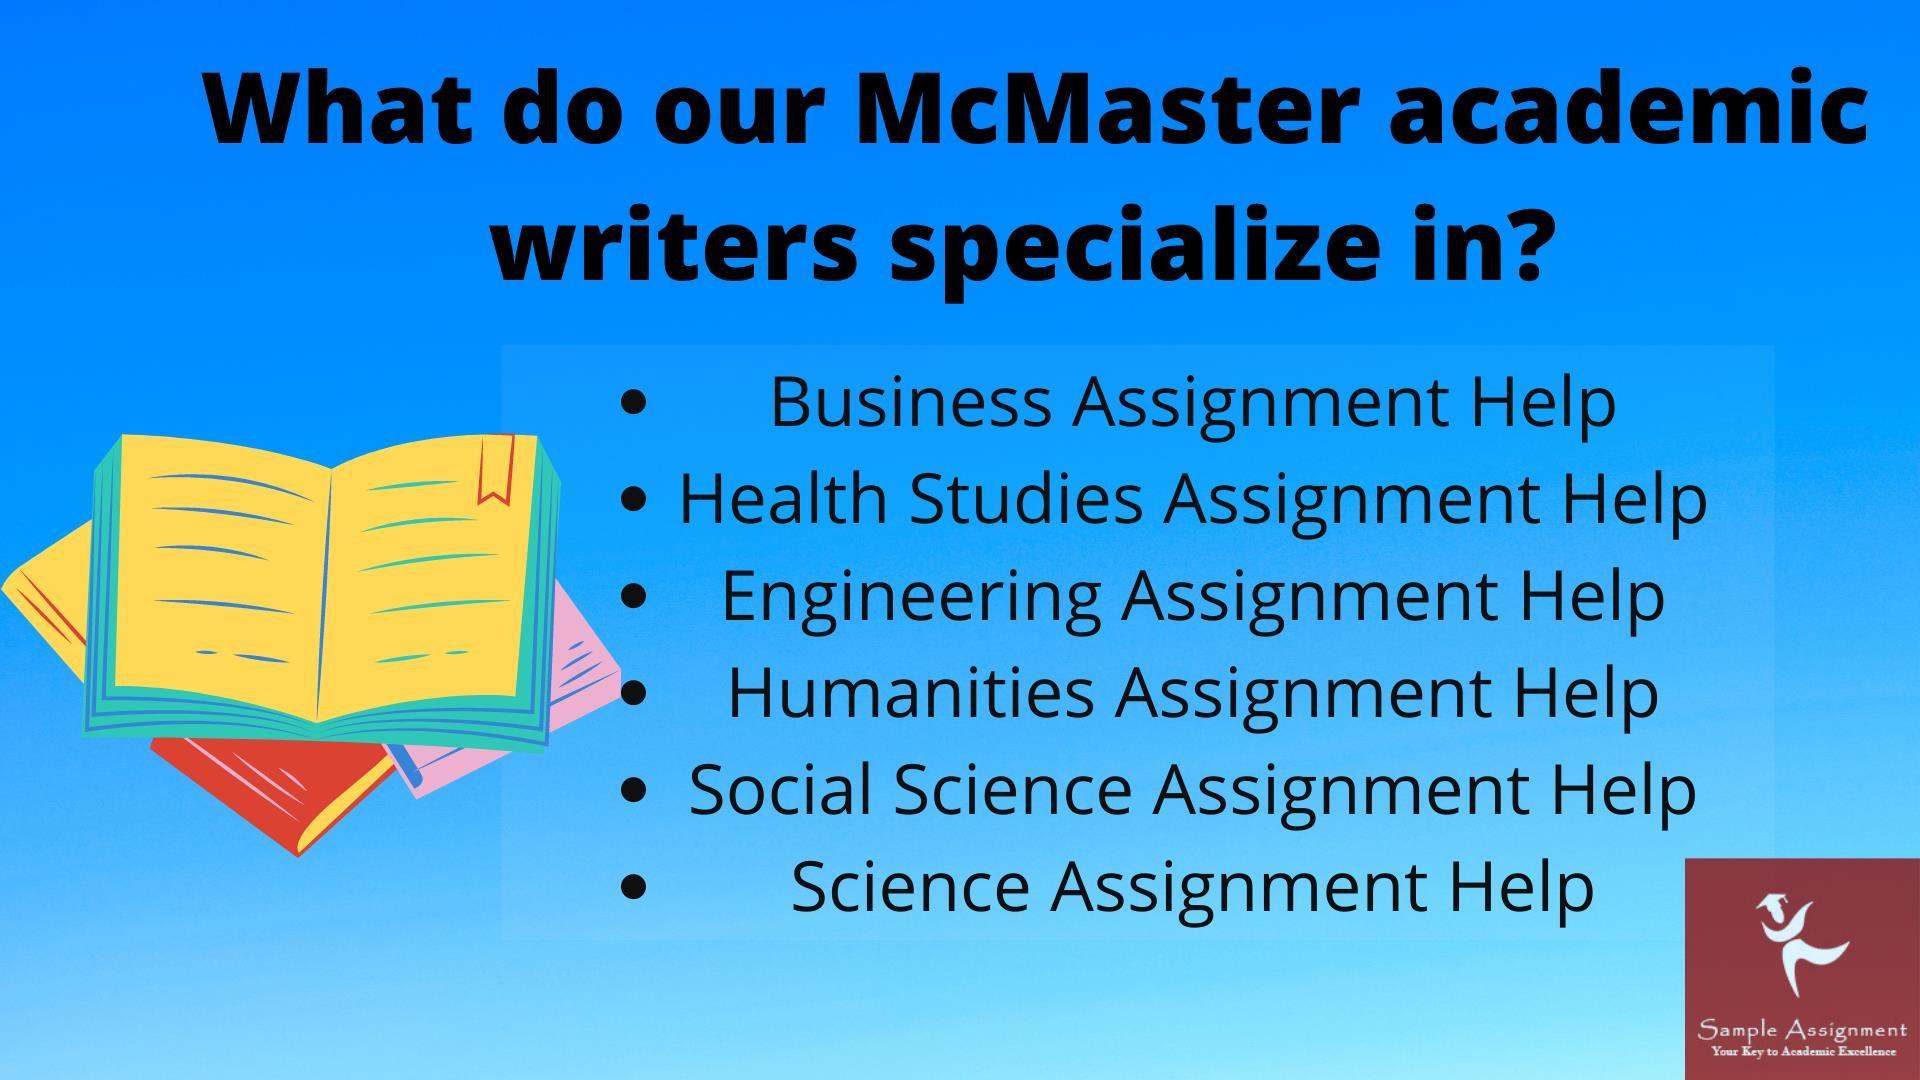 mcmaster university academic assistance through online tutoring canada